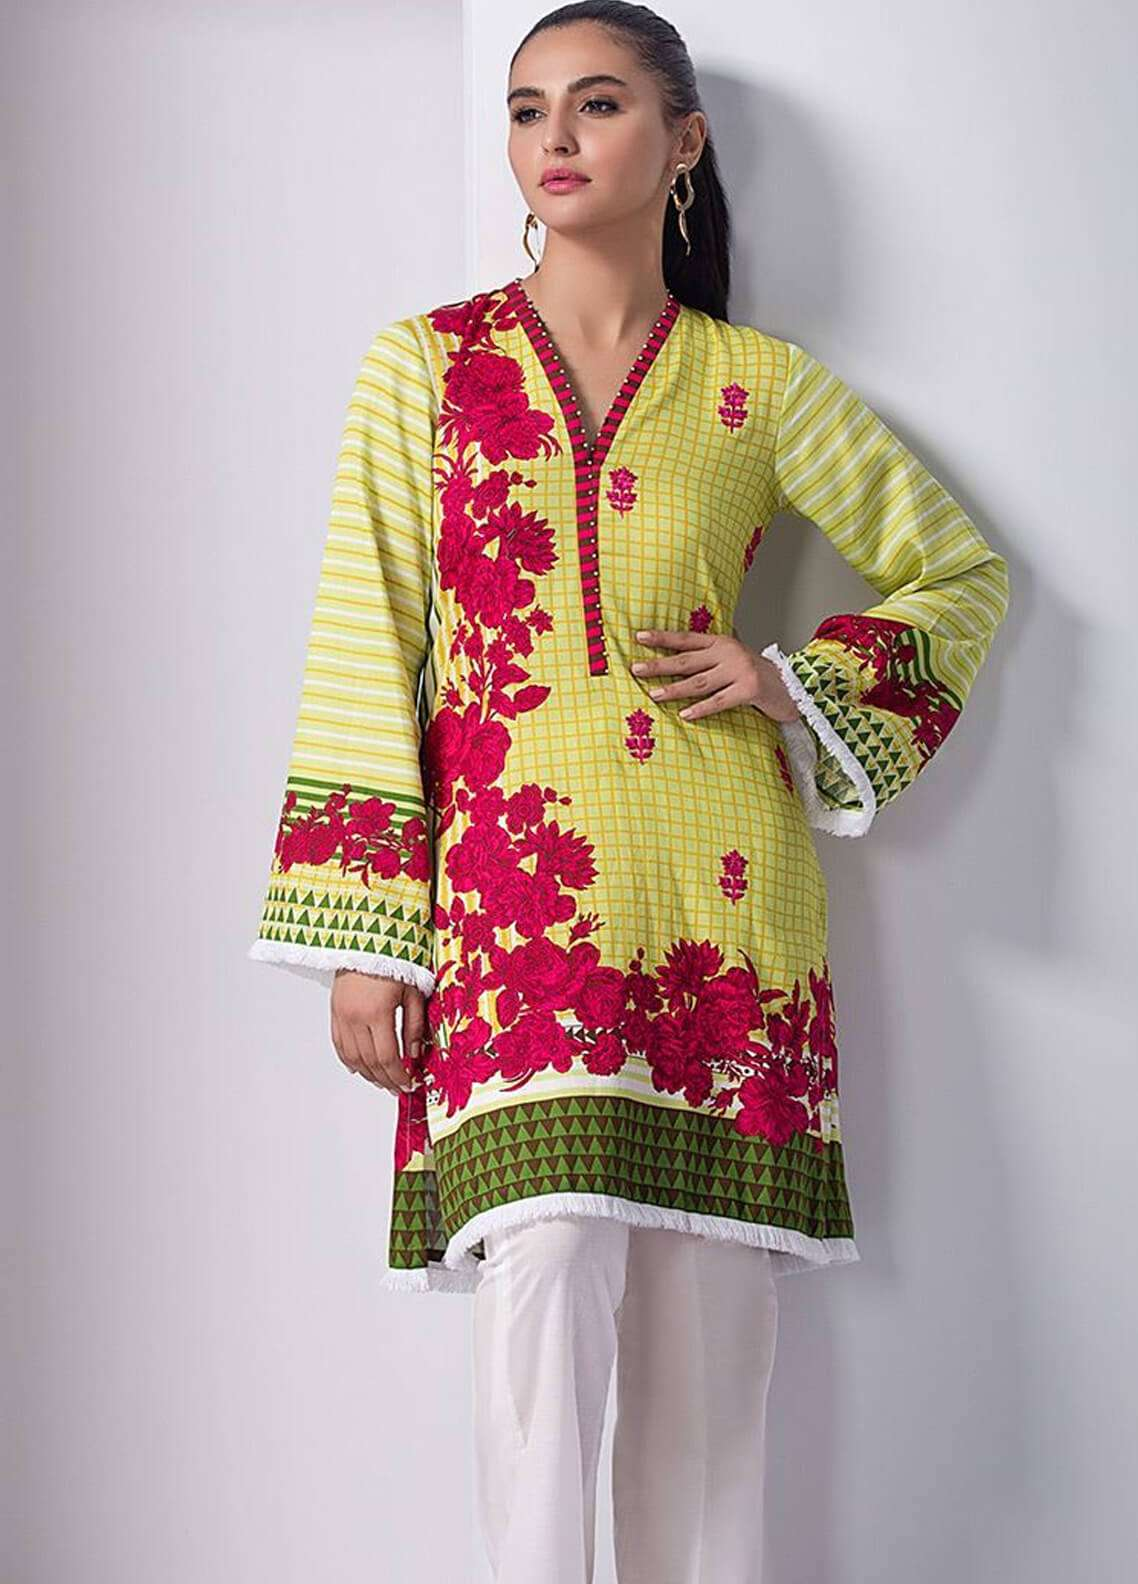 Orient Textile Embroidered Cotton Cotel Unstitched Kurties OT18W 217B Interlock - Winter Collection